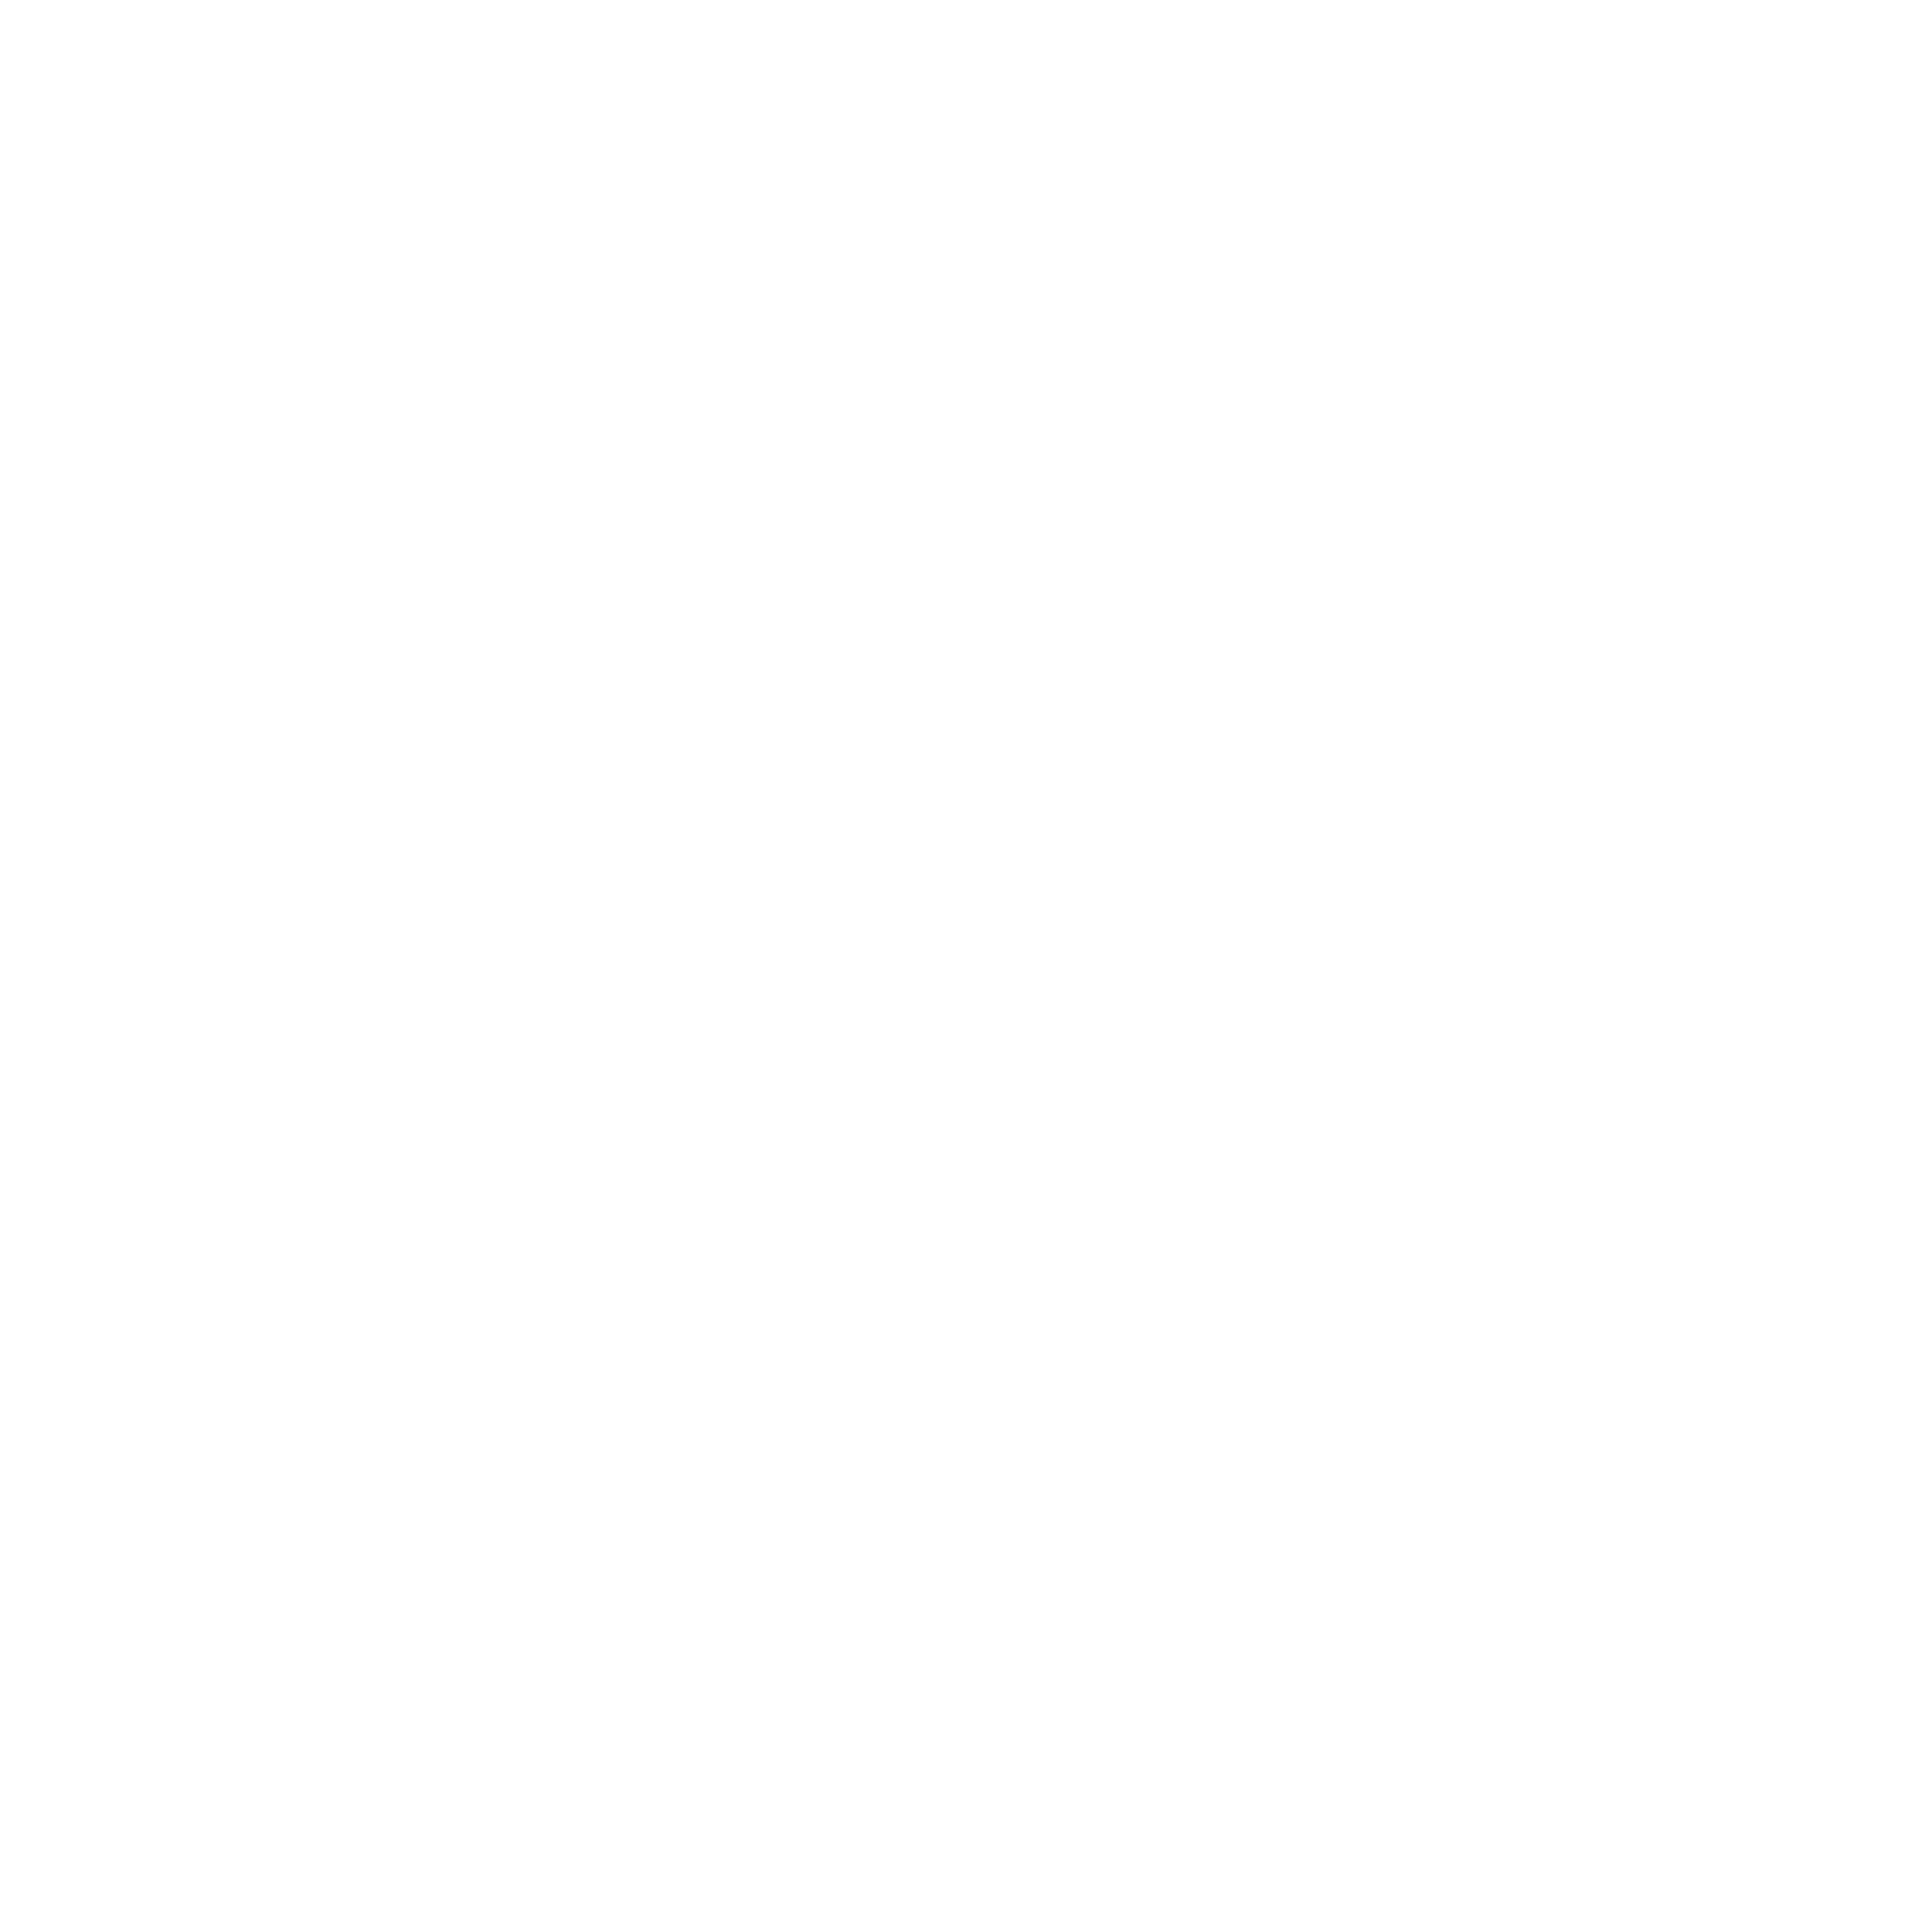 residence-01-01